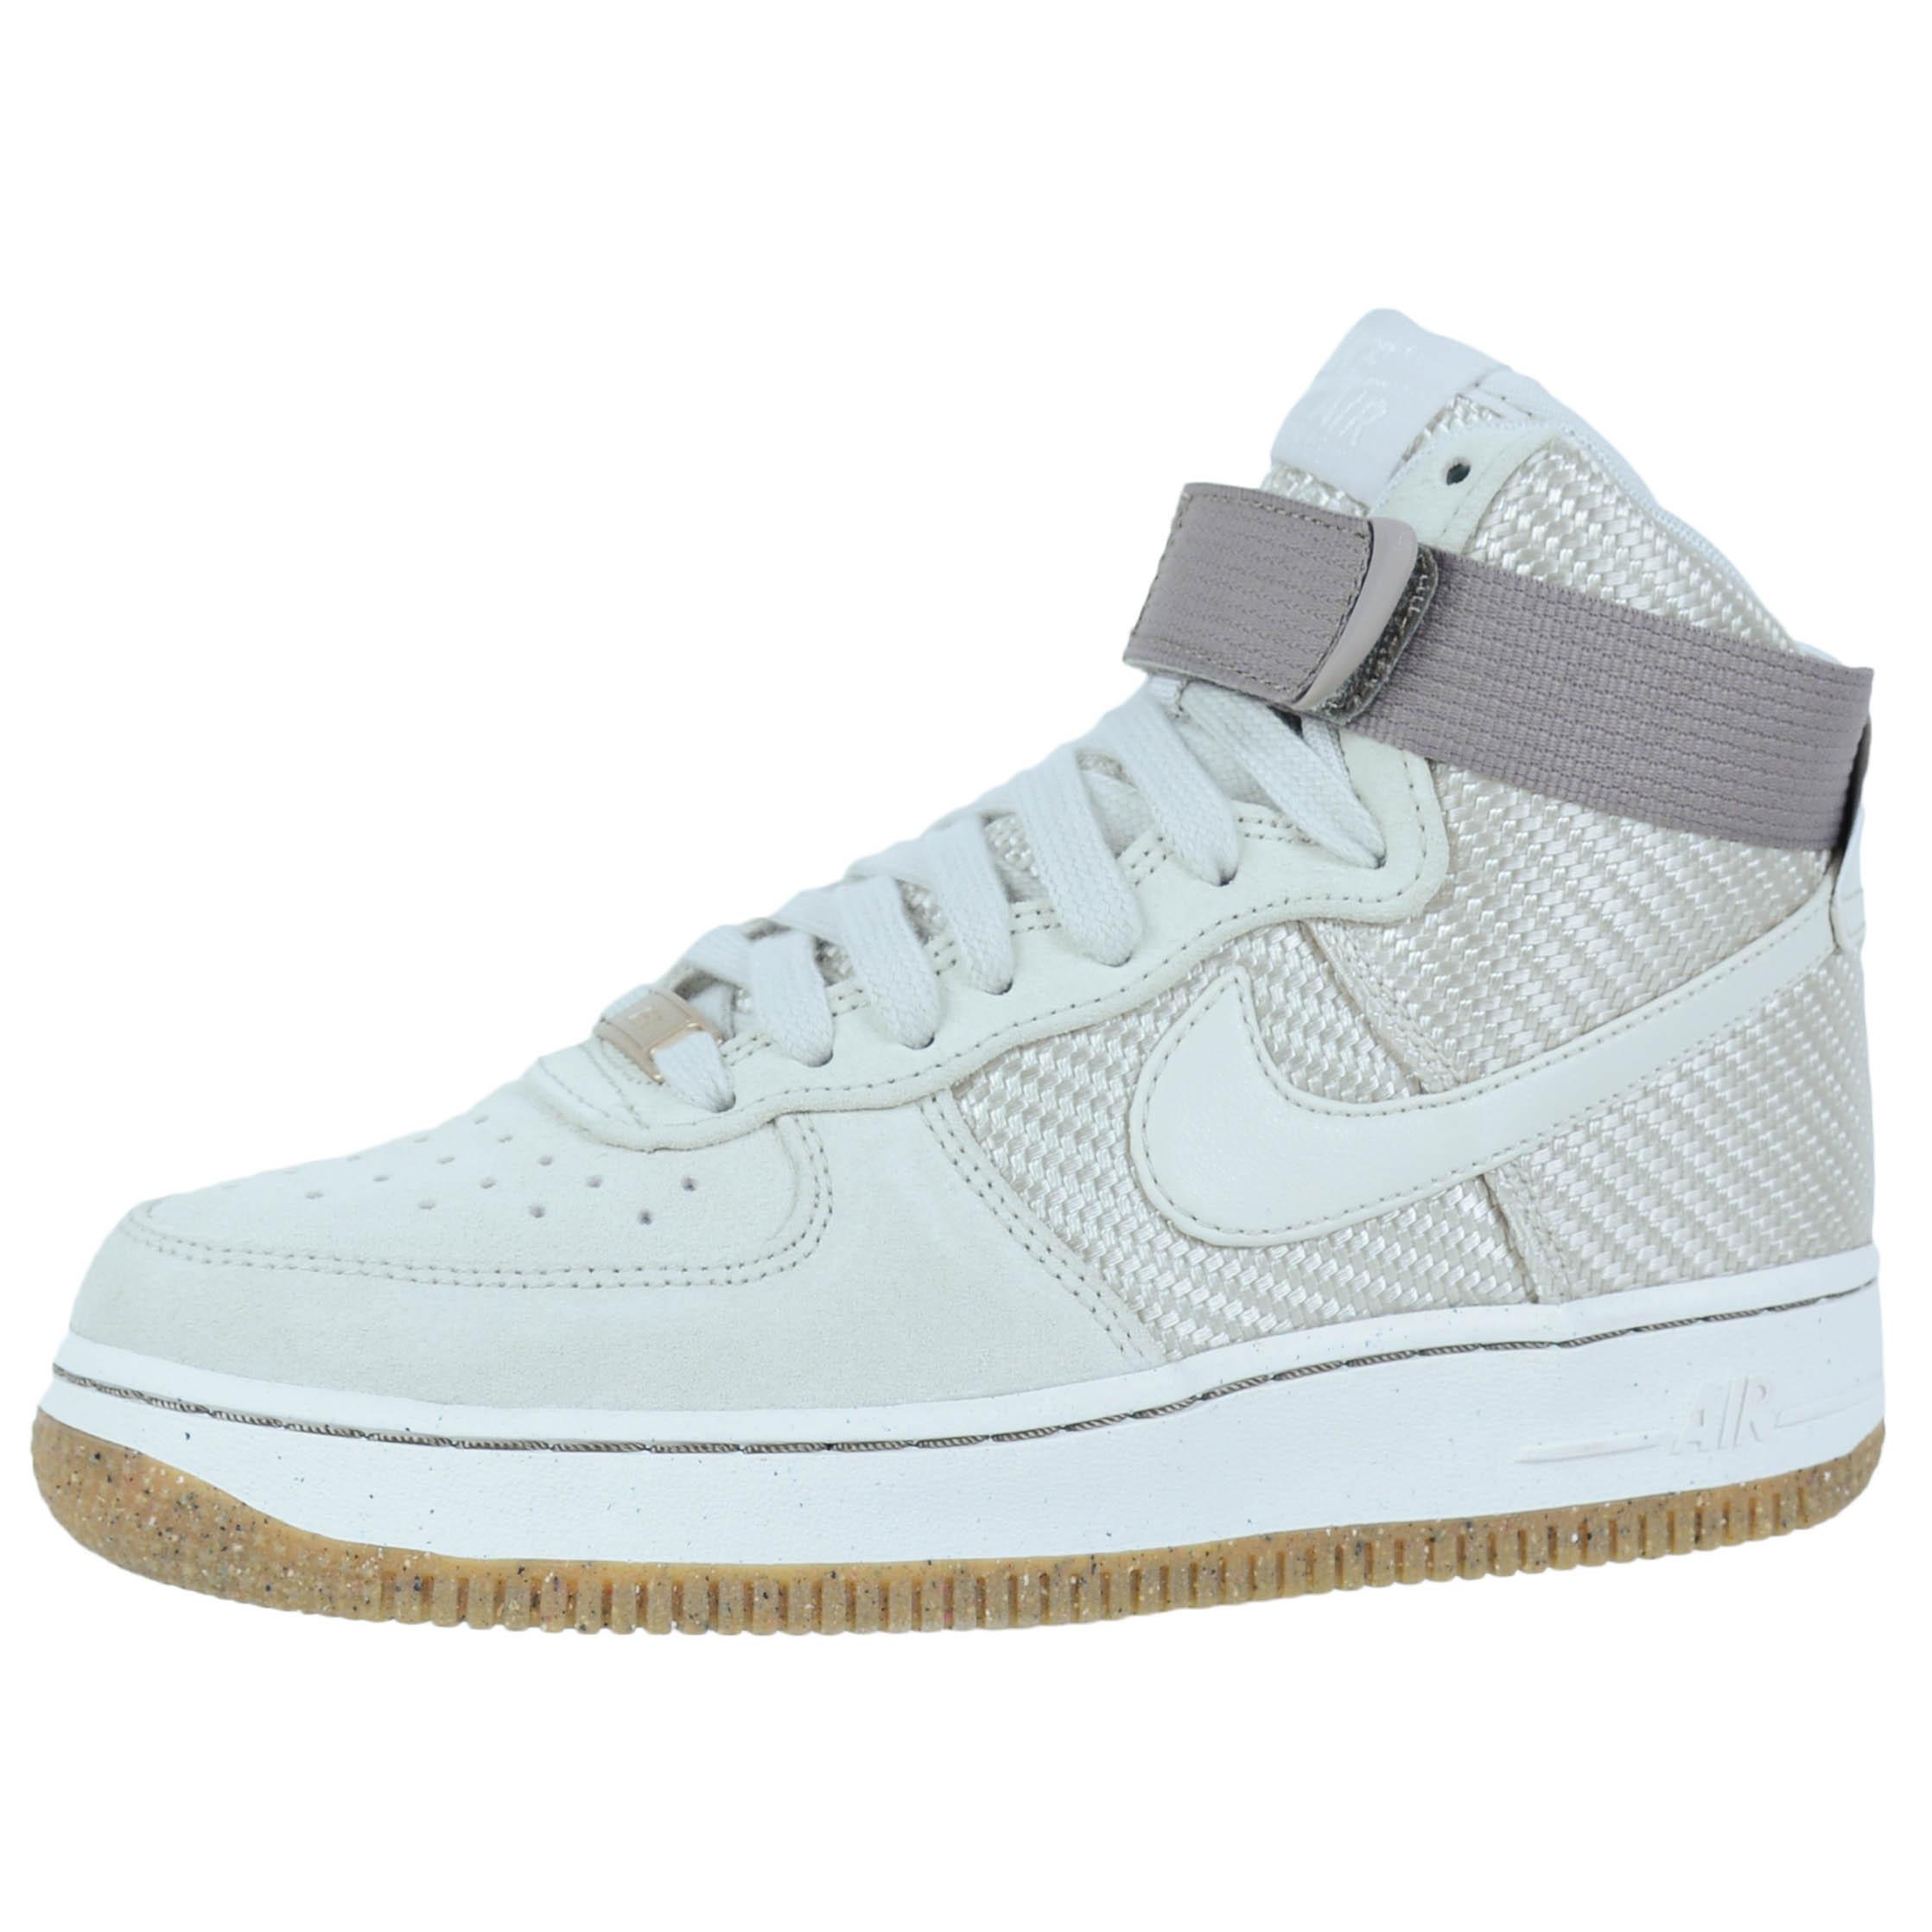 Gentlemen/Ladies-Nike Women's Air Basketball Force 1 Hi Prm Basketball Air Shoe- Lush in design ce049e